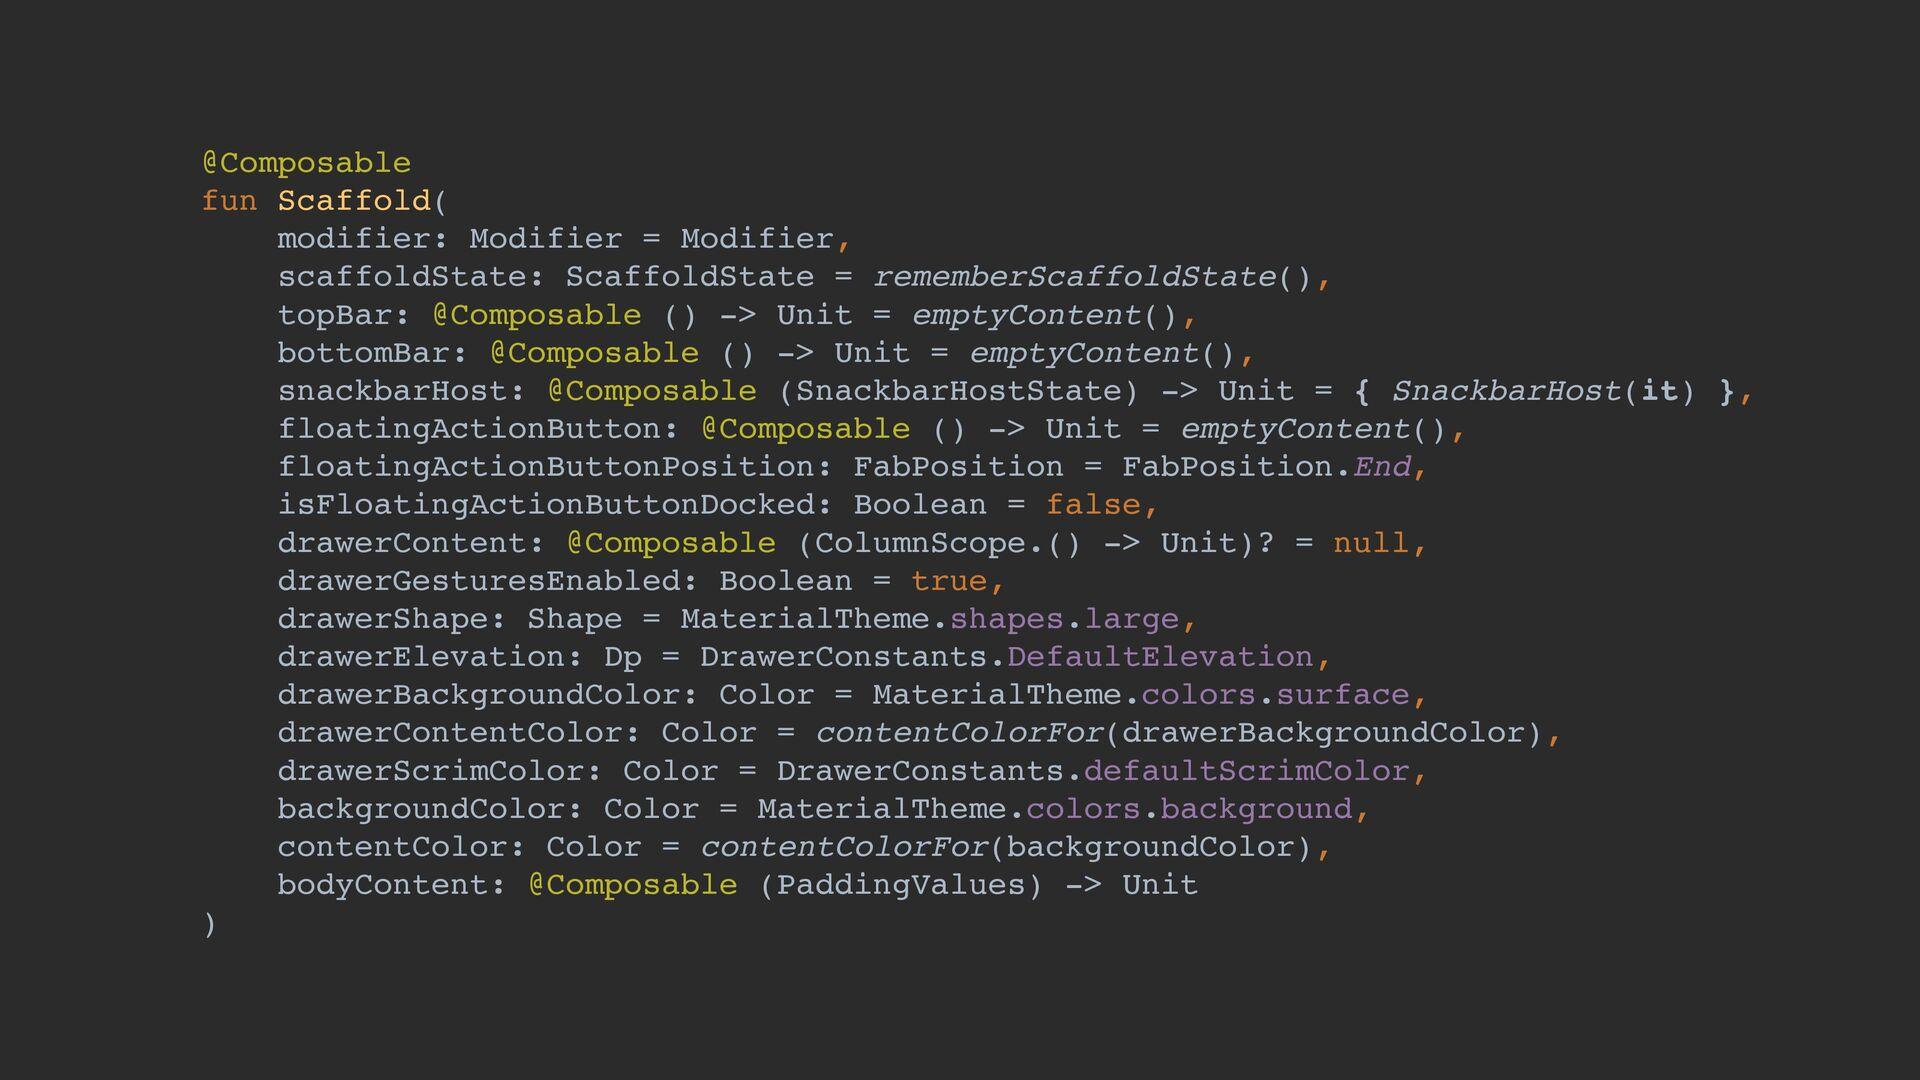 @Composable fun Scaffold( modifier: Modifier = ...